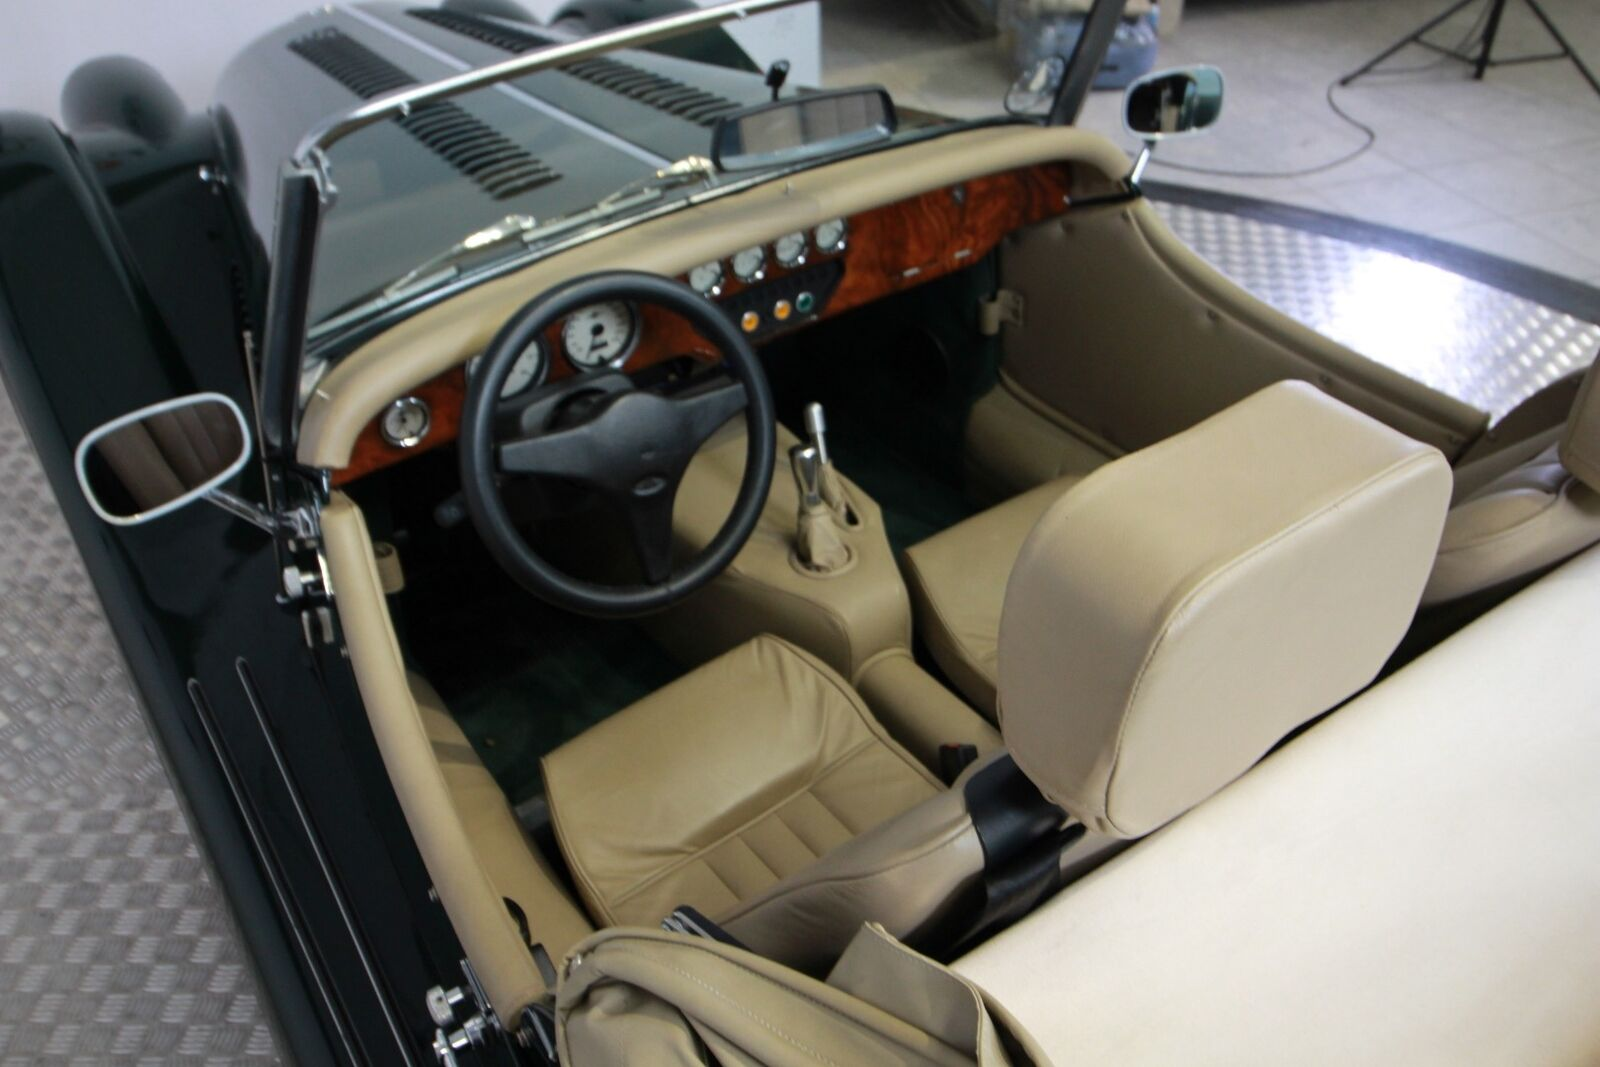 Morgan Plus 8 2 seater